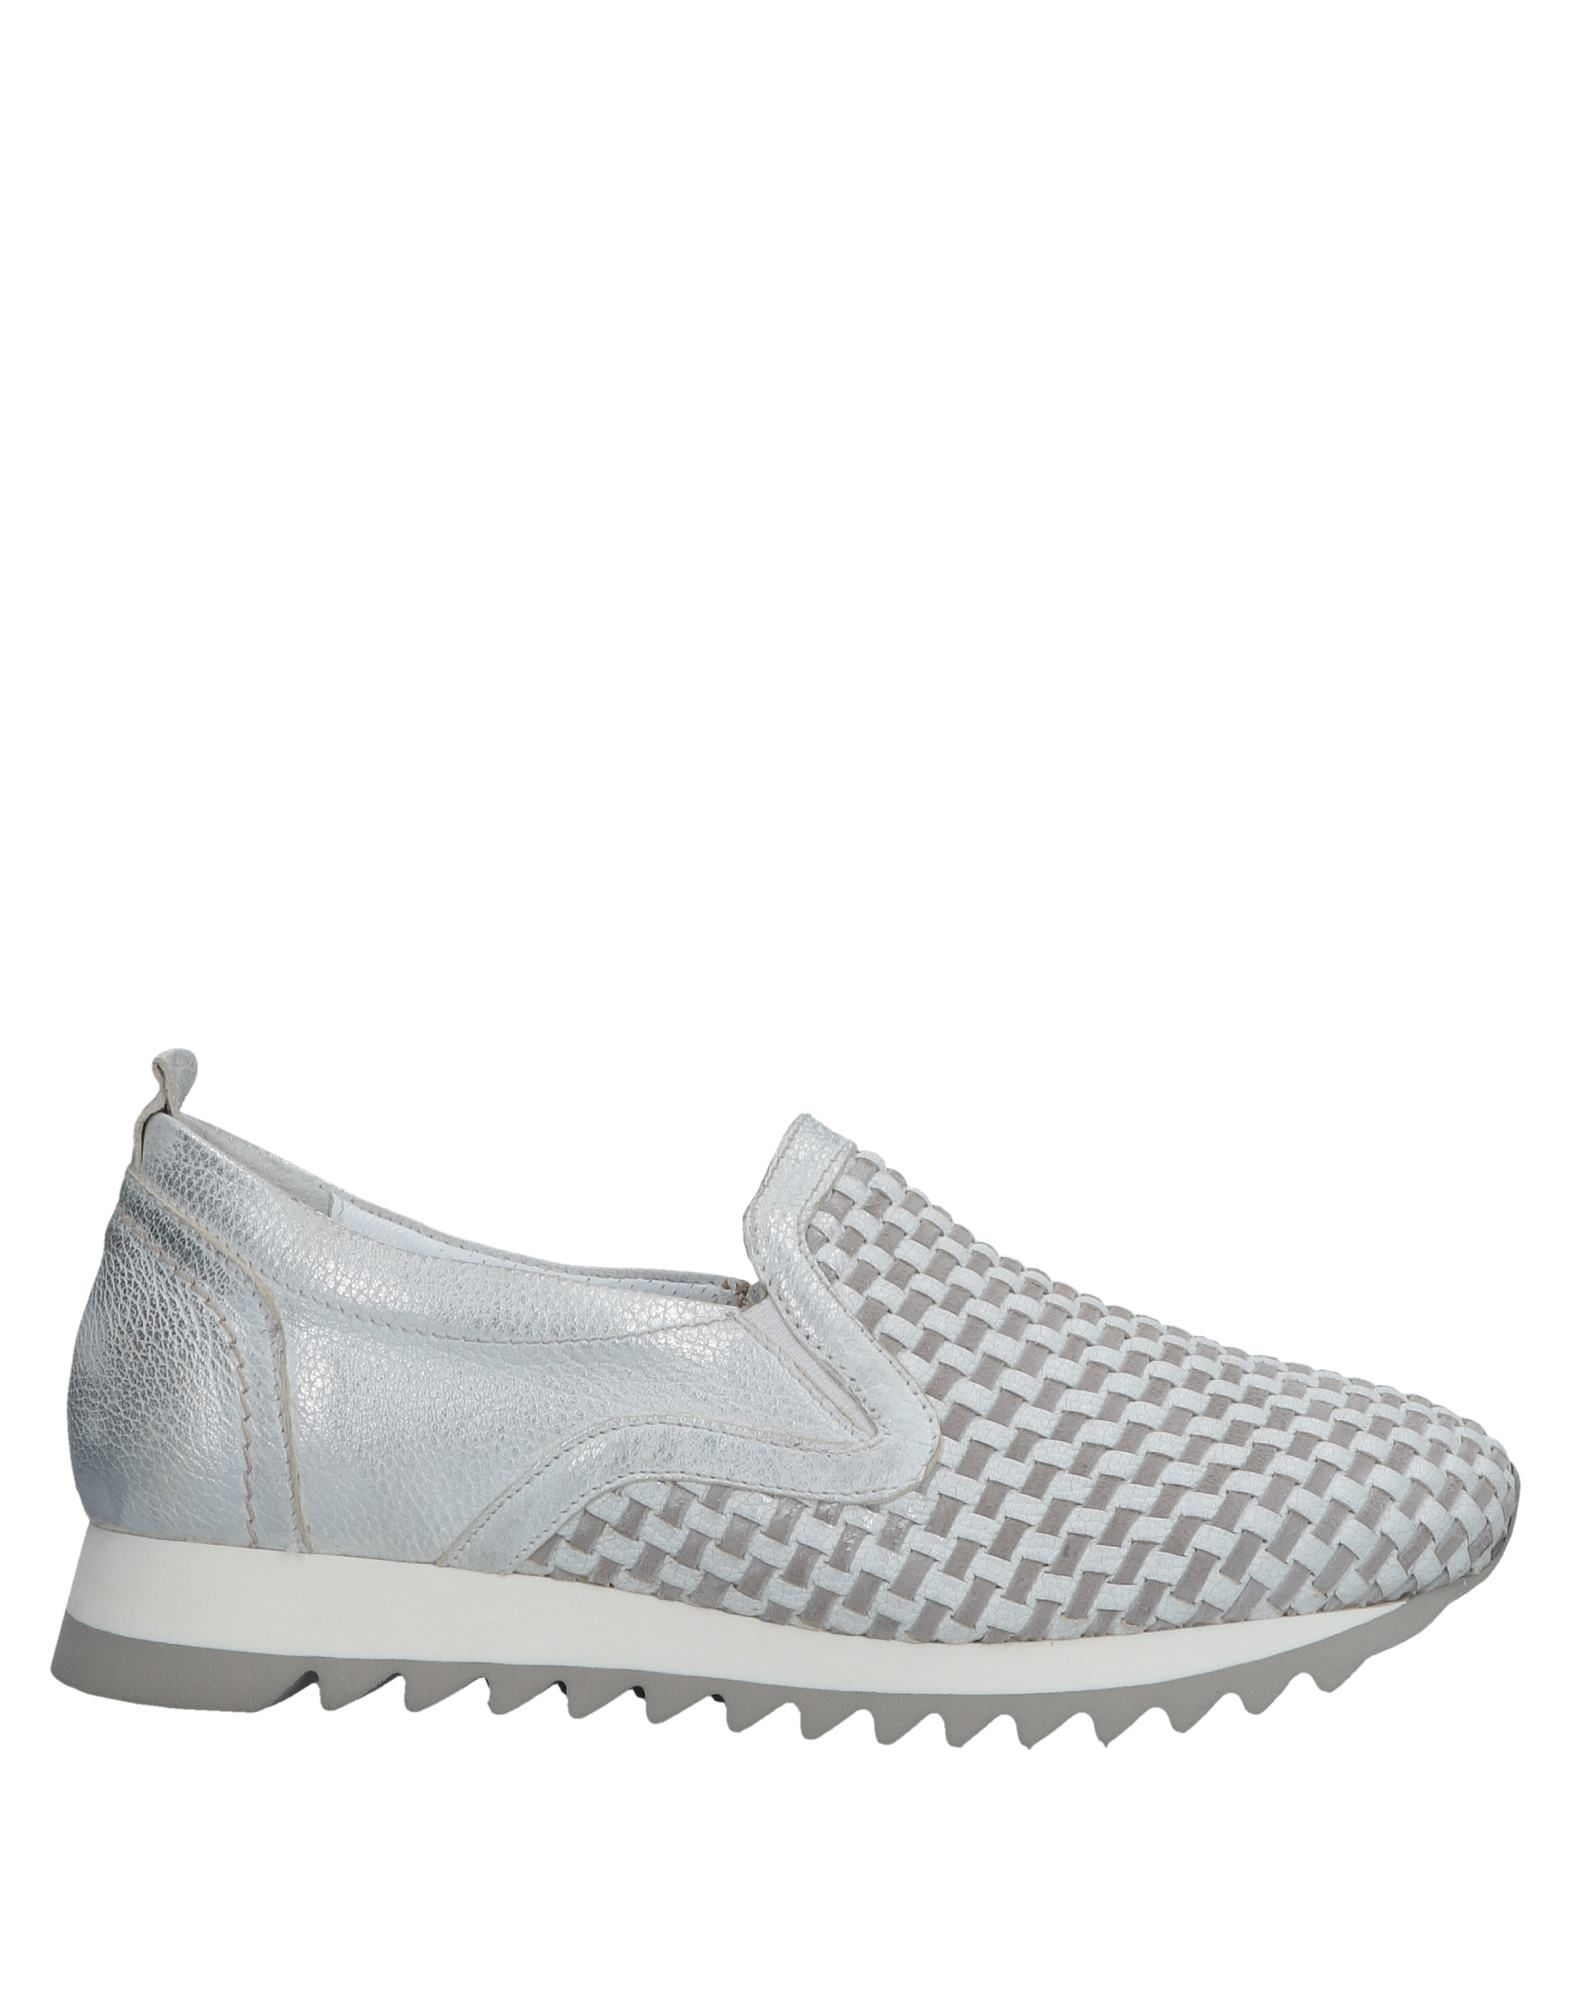 Stilvolle billige Schuhe Calpierre Sneakers Damen  11579405QC